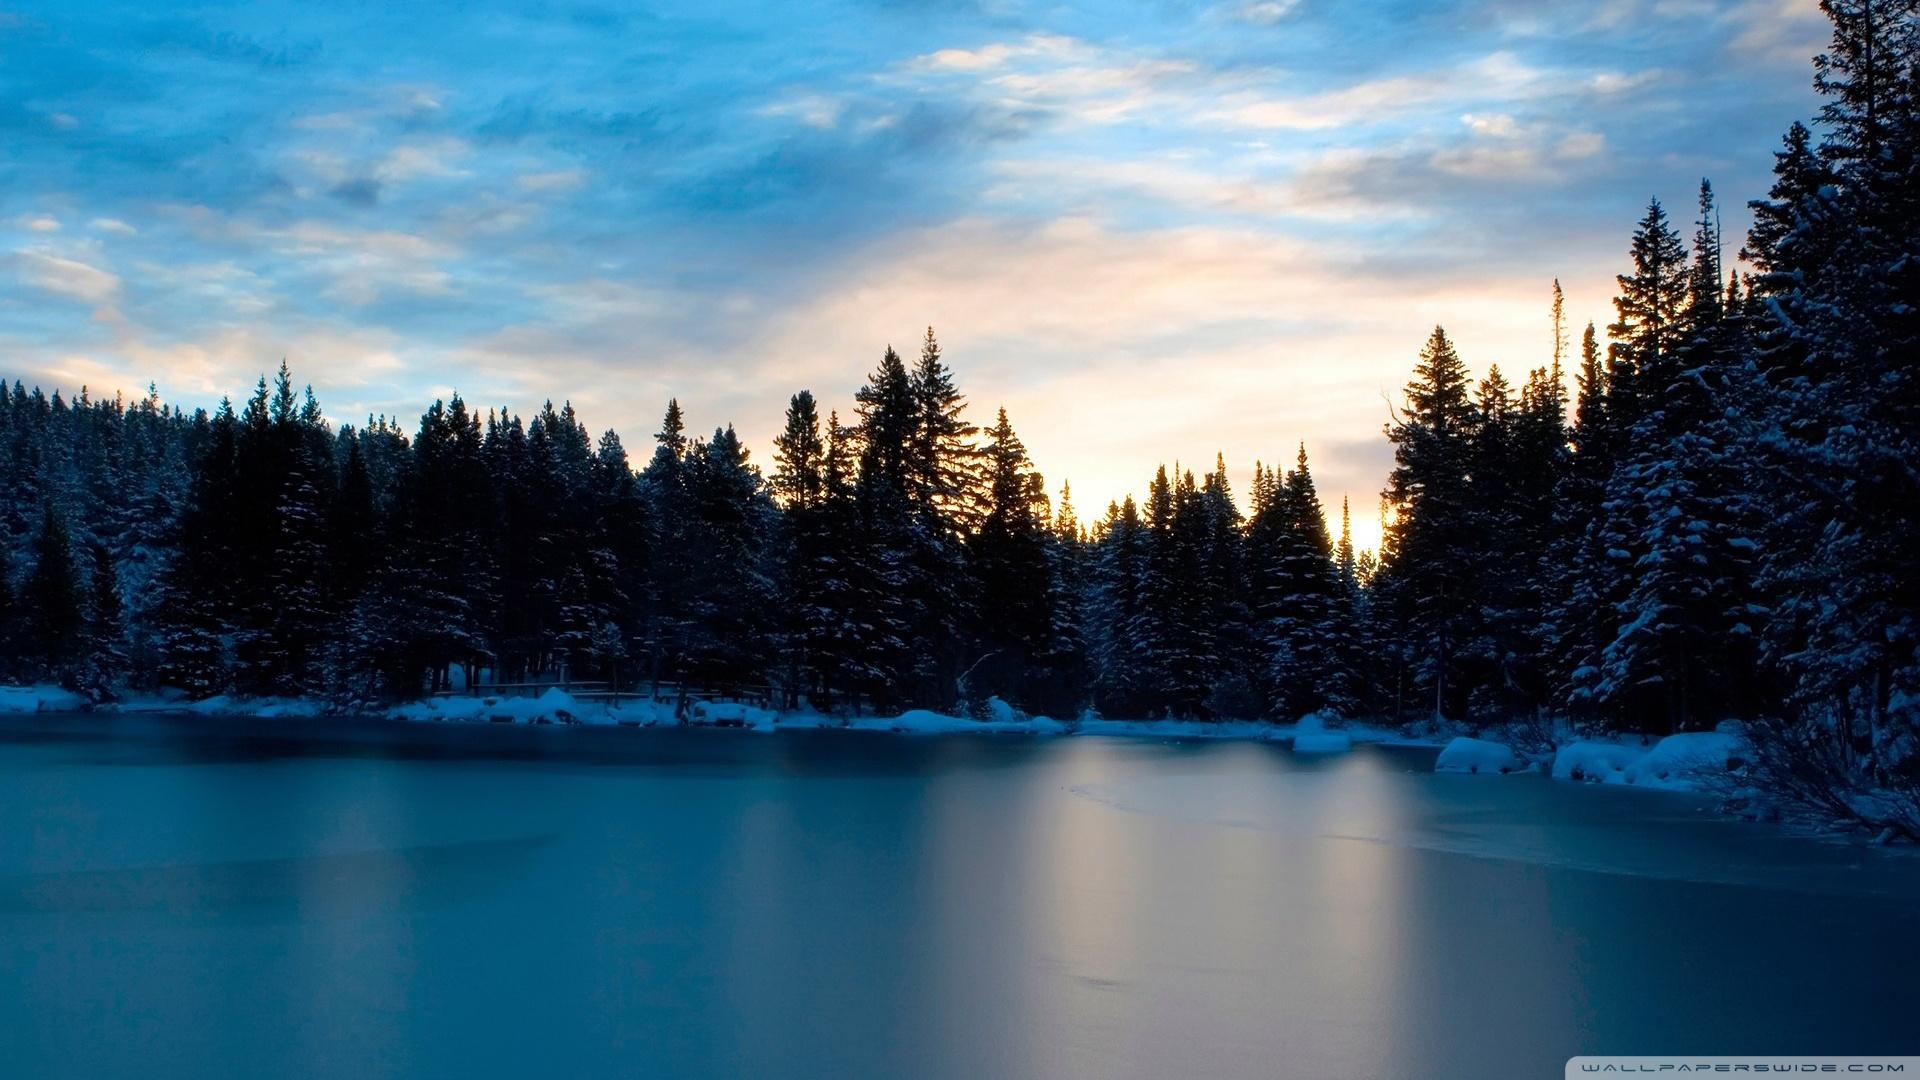 Frozen Lake Wallpapers